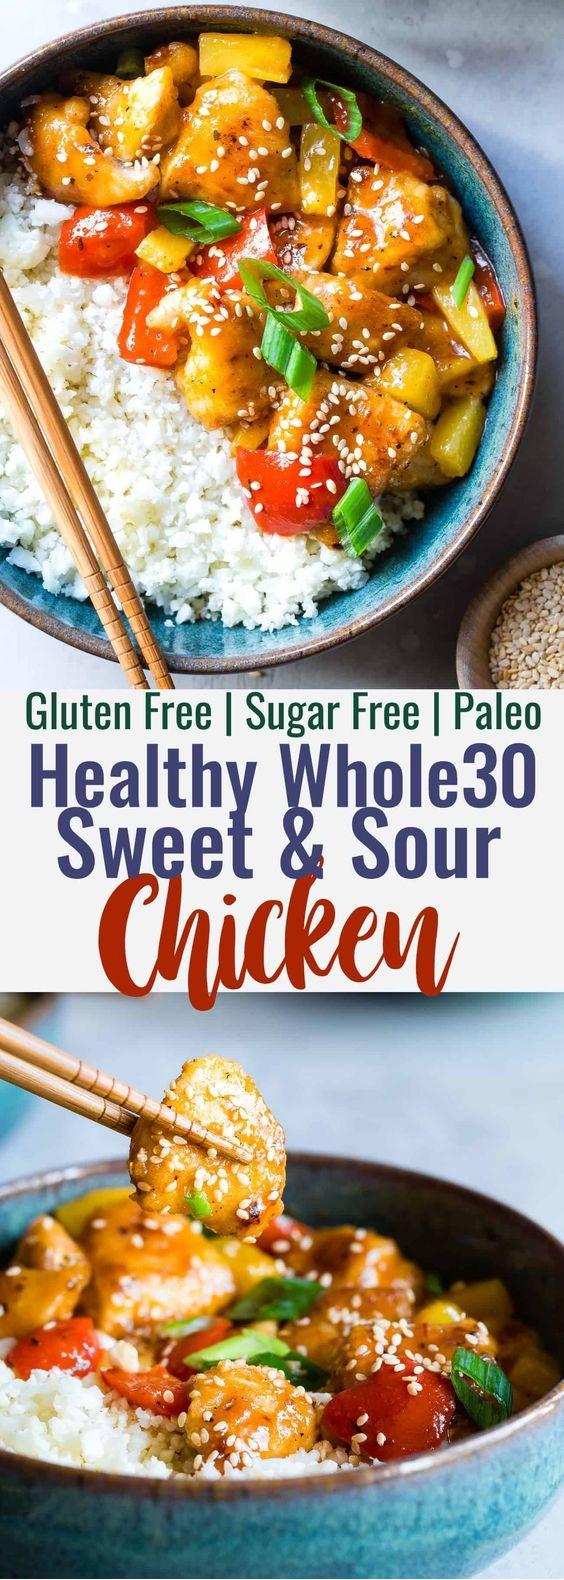 Paleo Gluten Free Healthy Sweet And Sour Chicken